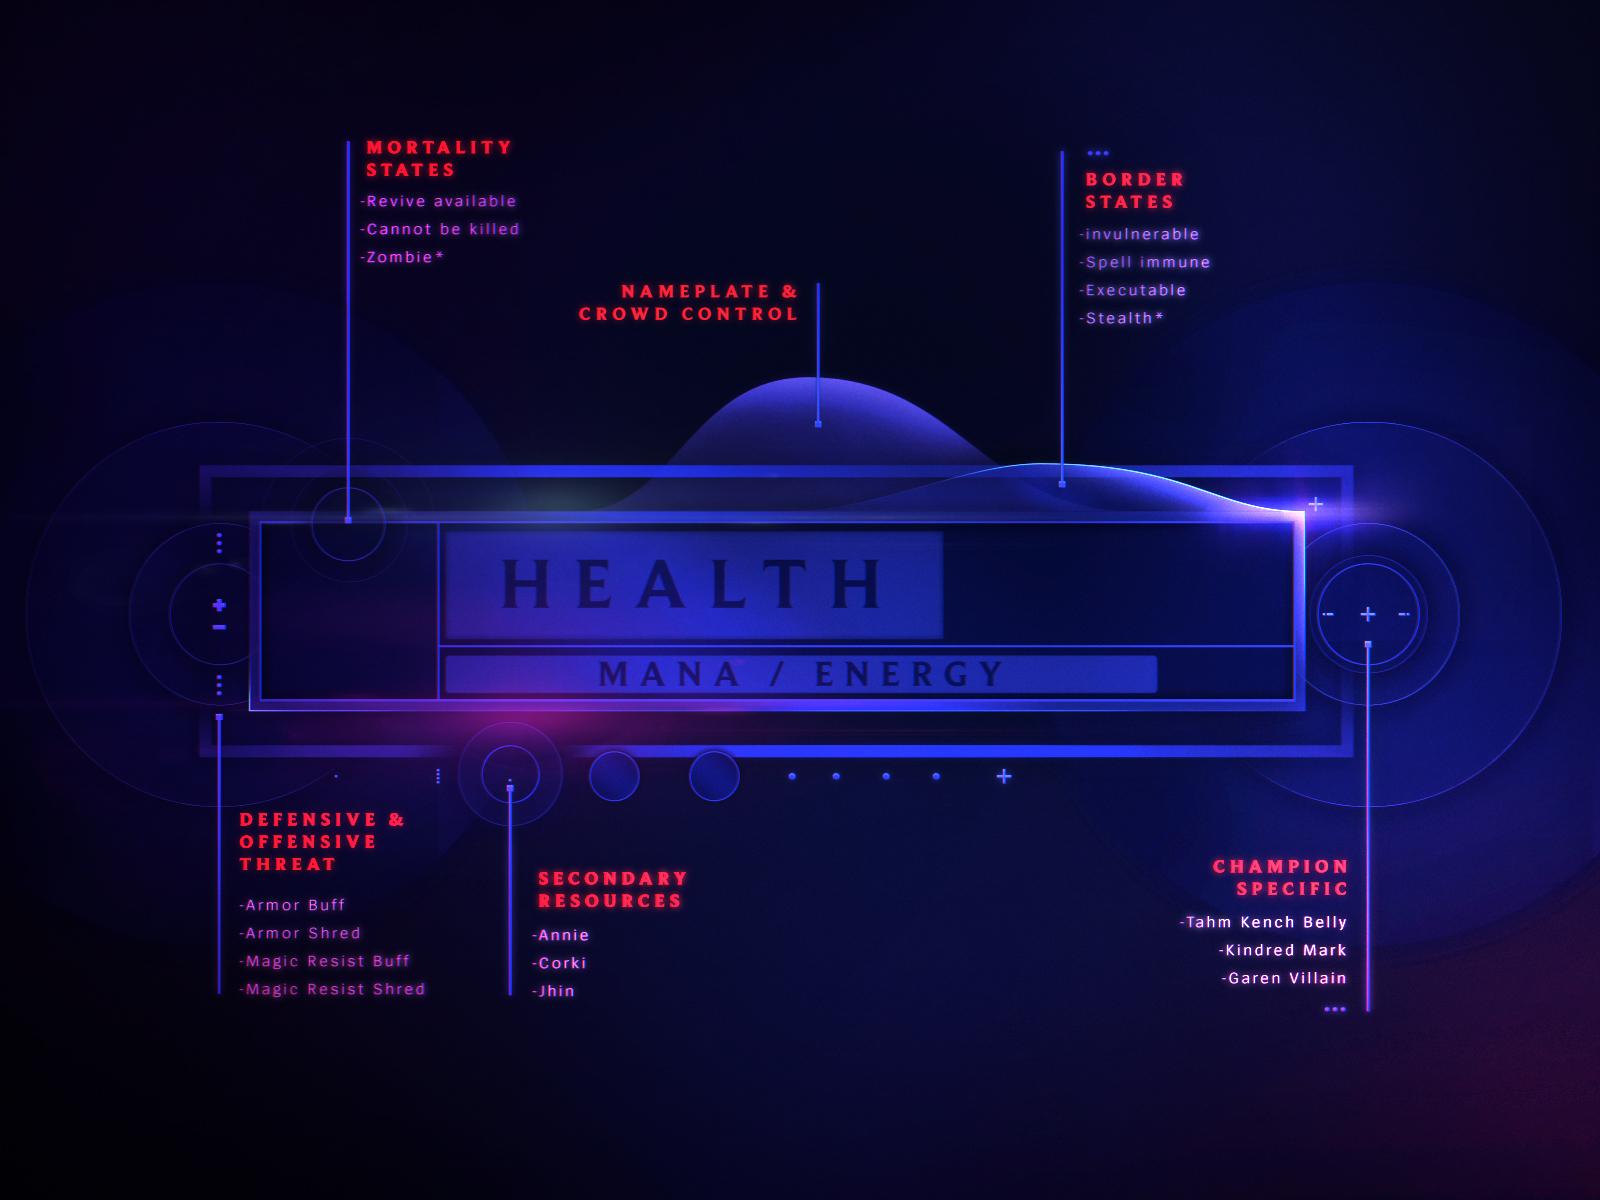 Healthbaranatomy